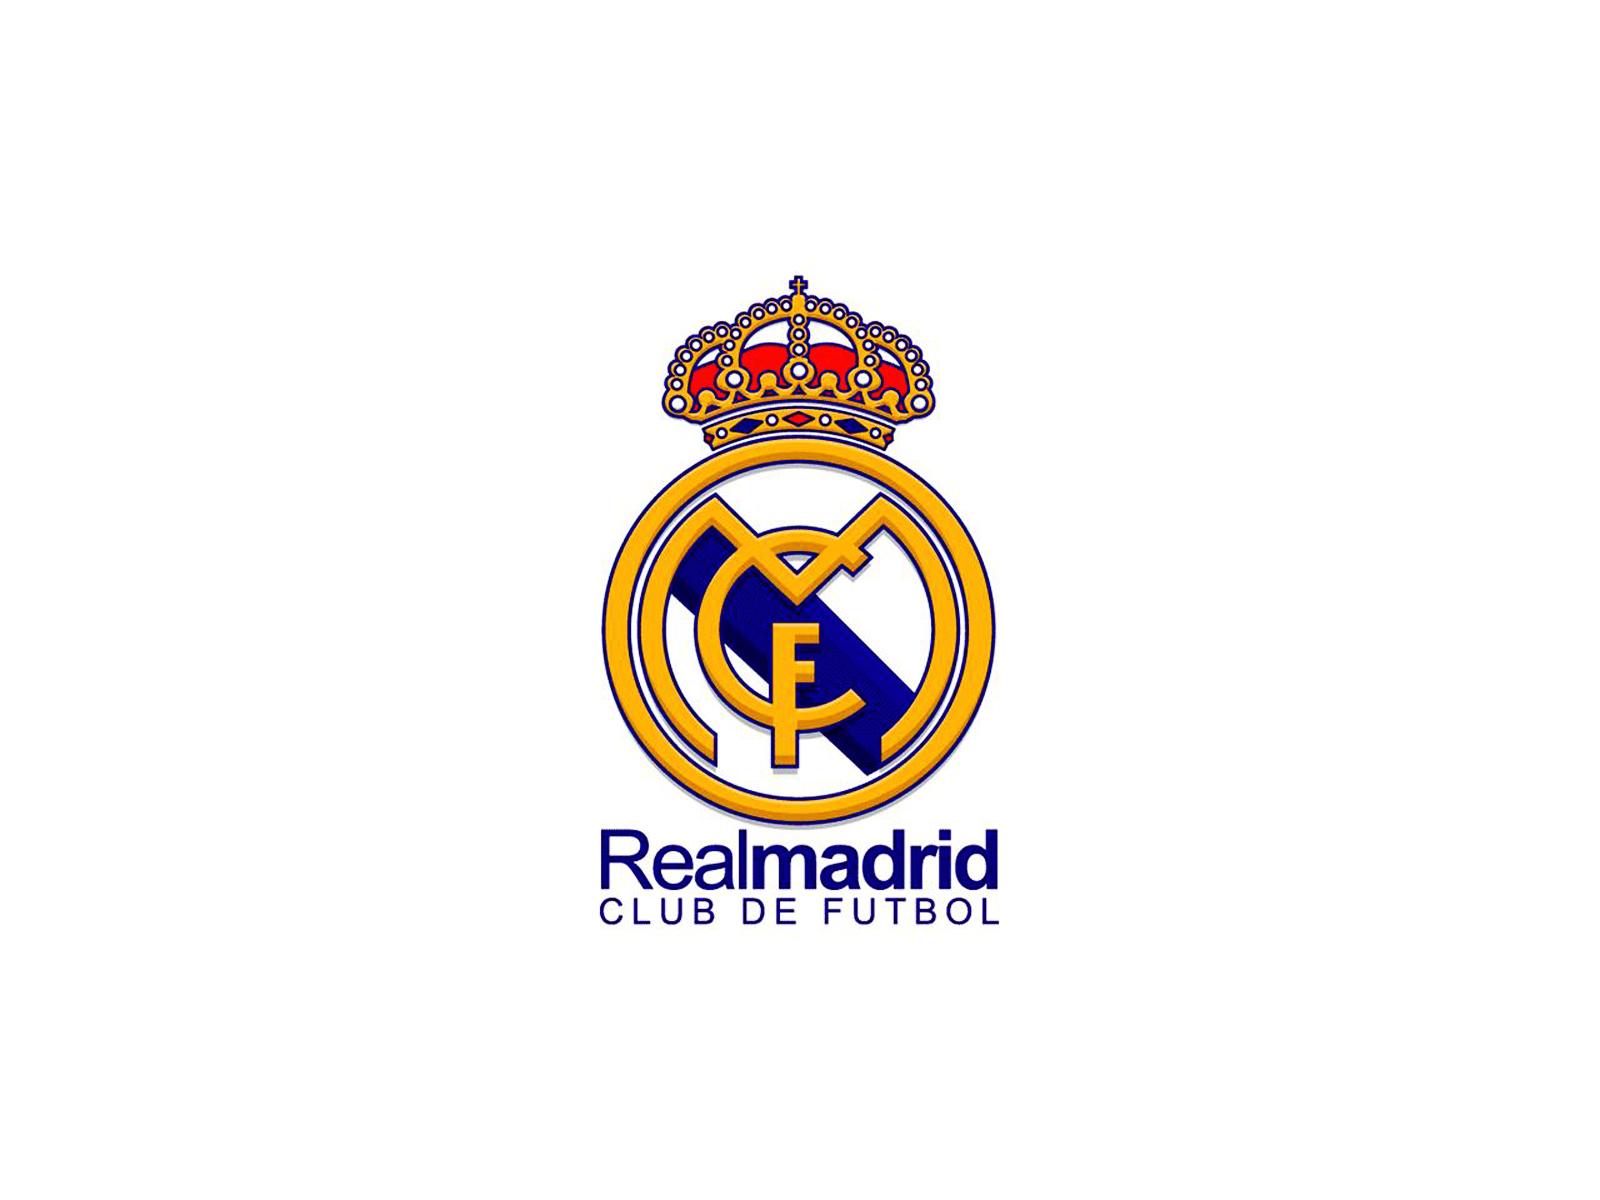 Real Madrid CF Logo HD Desktop Wallpapers| HD Wallpapers ...